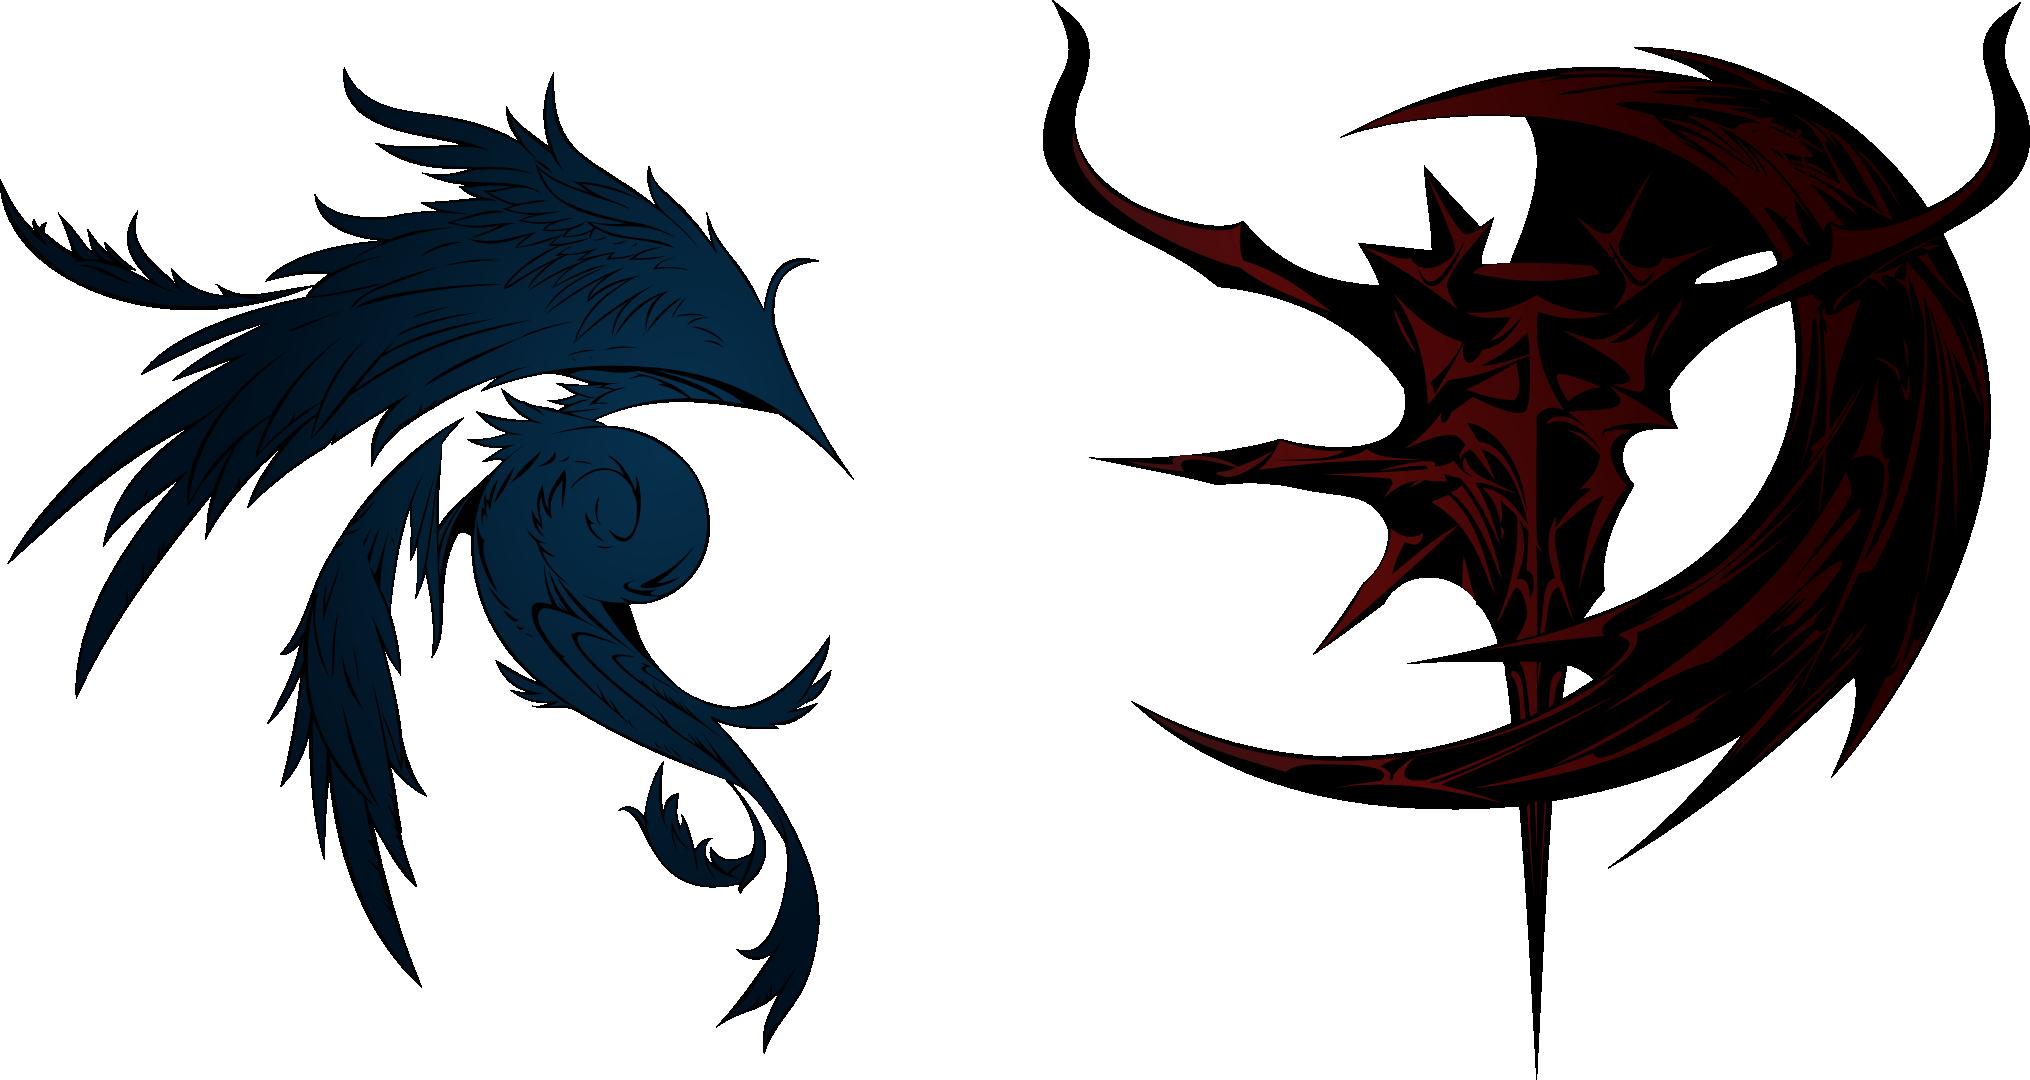 Logos And chaos logos by eldi13